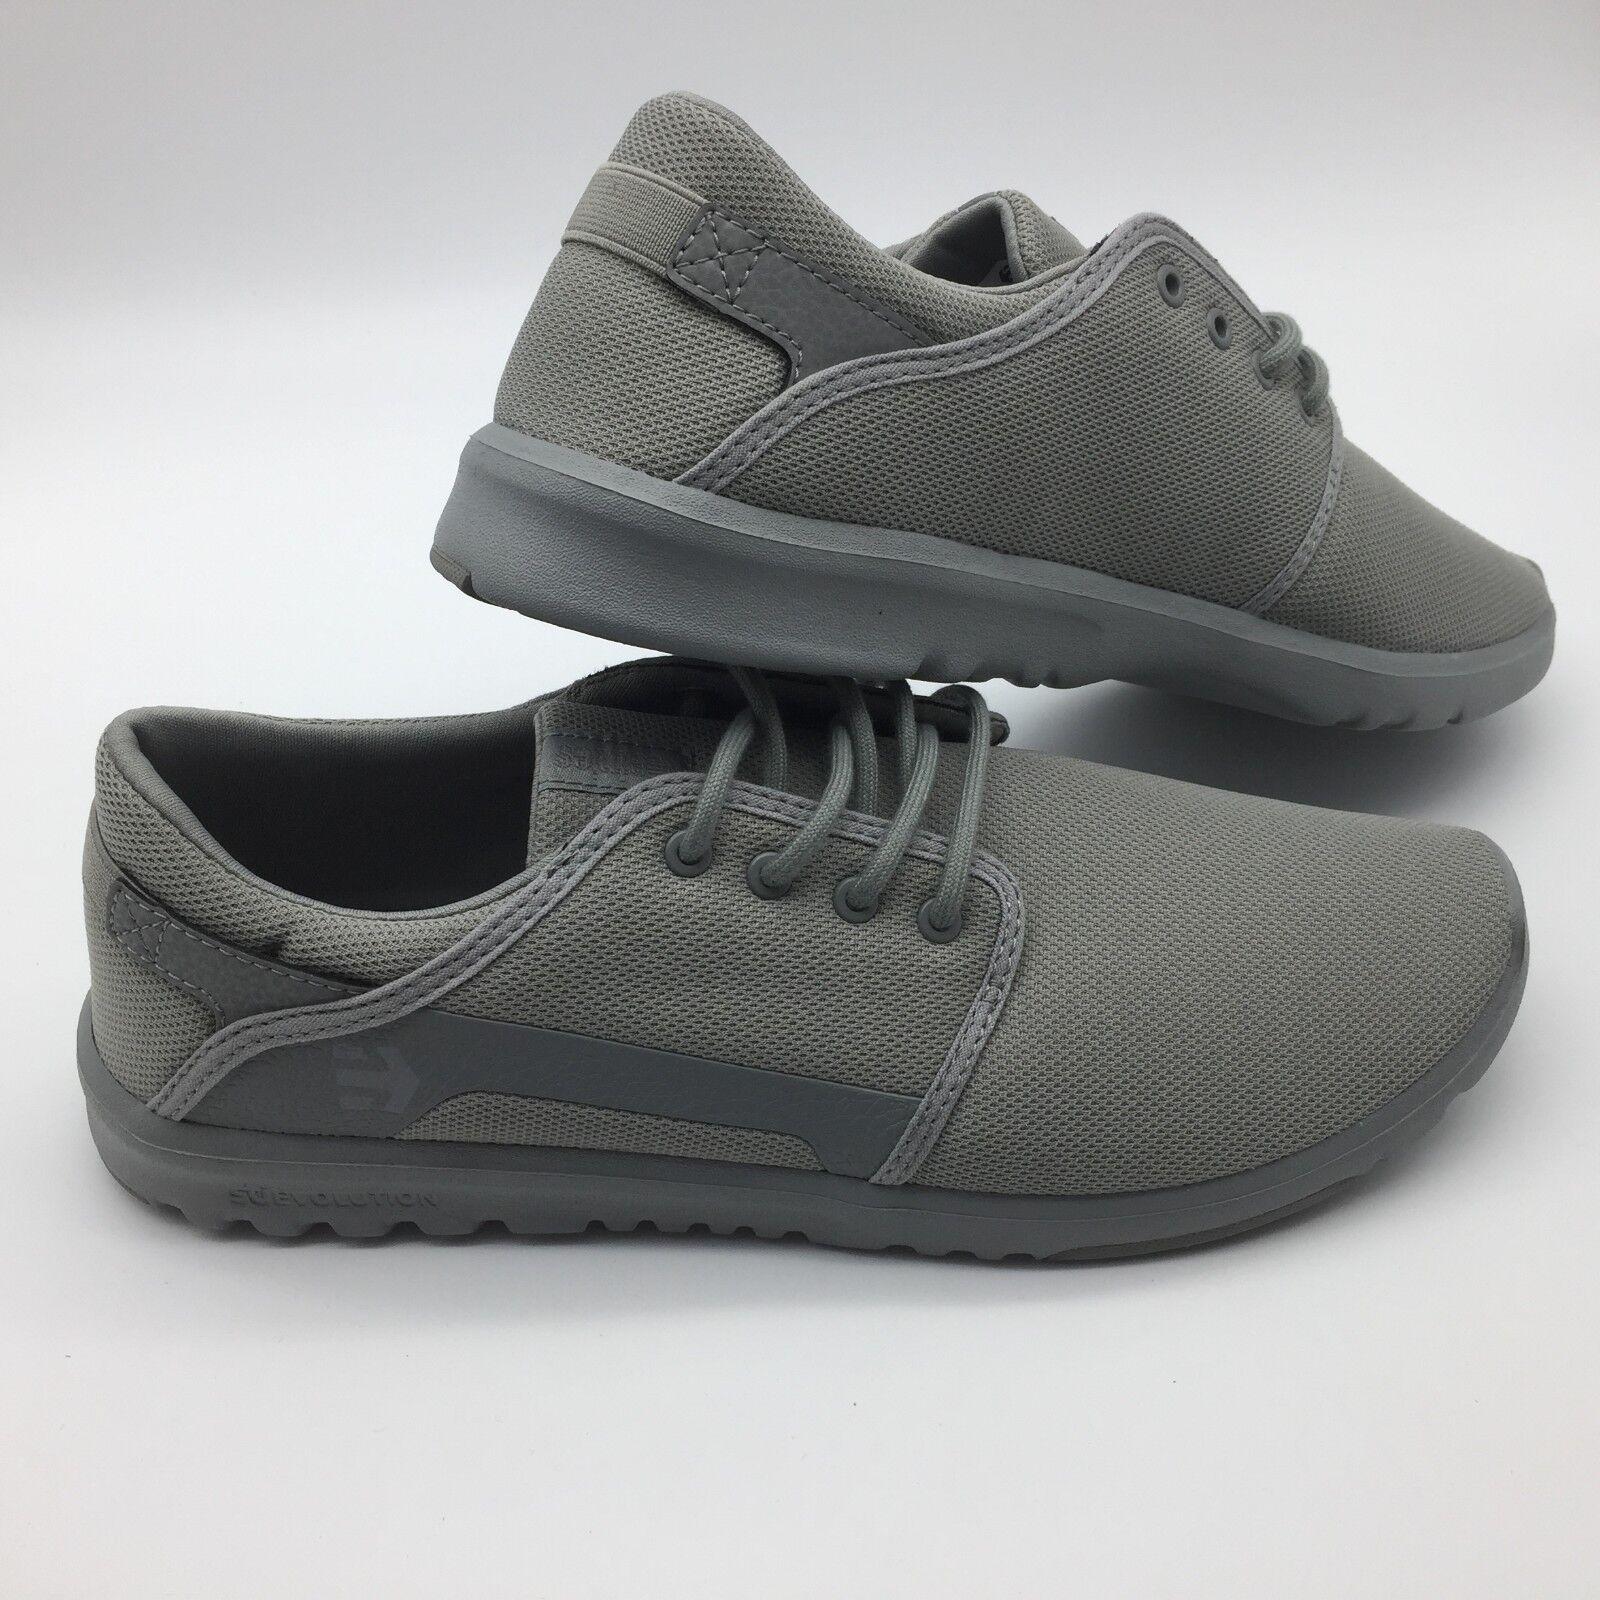 Scout Schuhe Herren Etnies Smu Grau 523afxlno44475 Sneaker